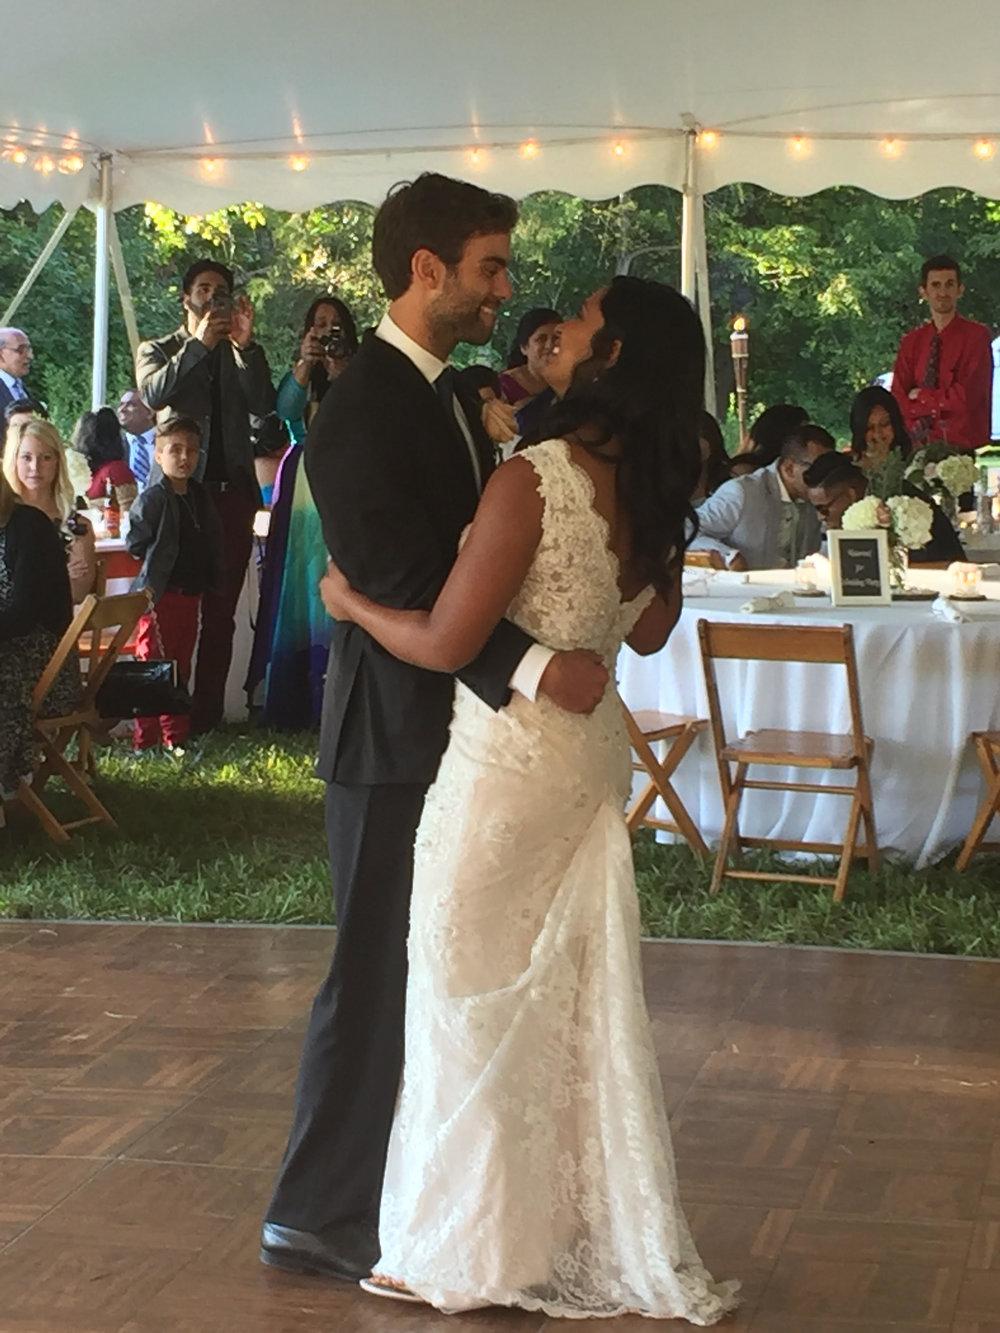 crozet-va-wedding.jpg